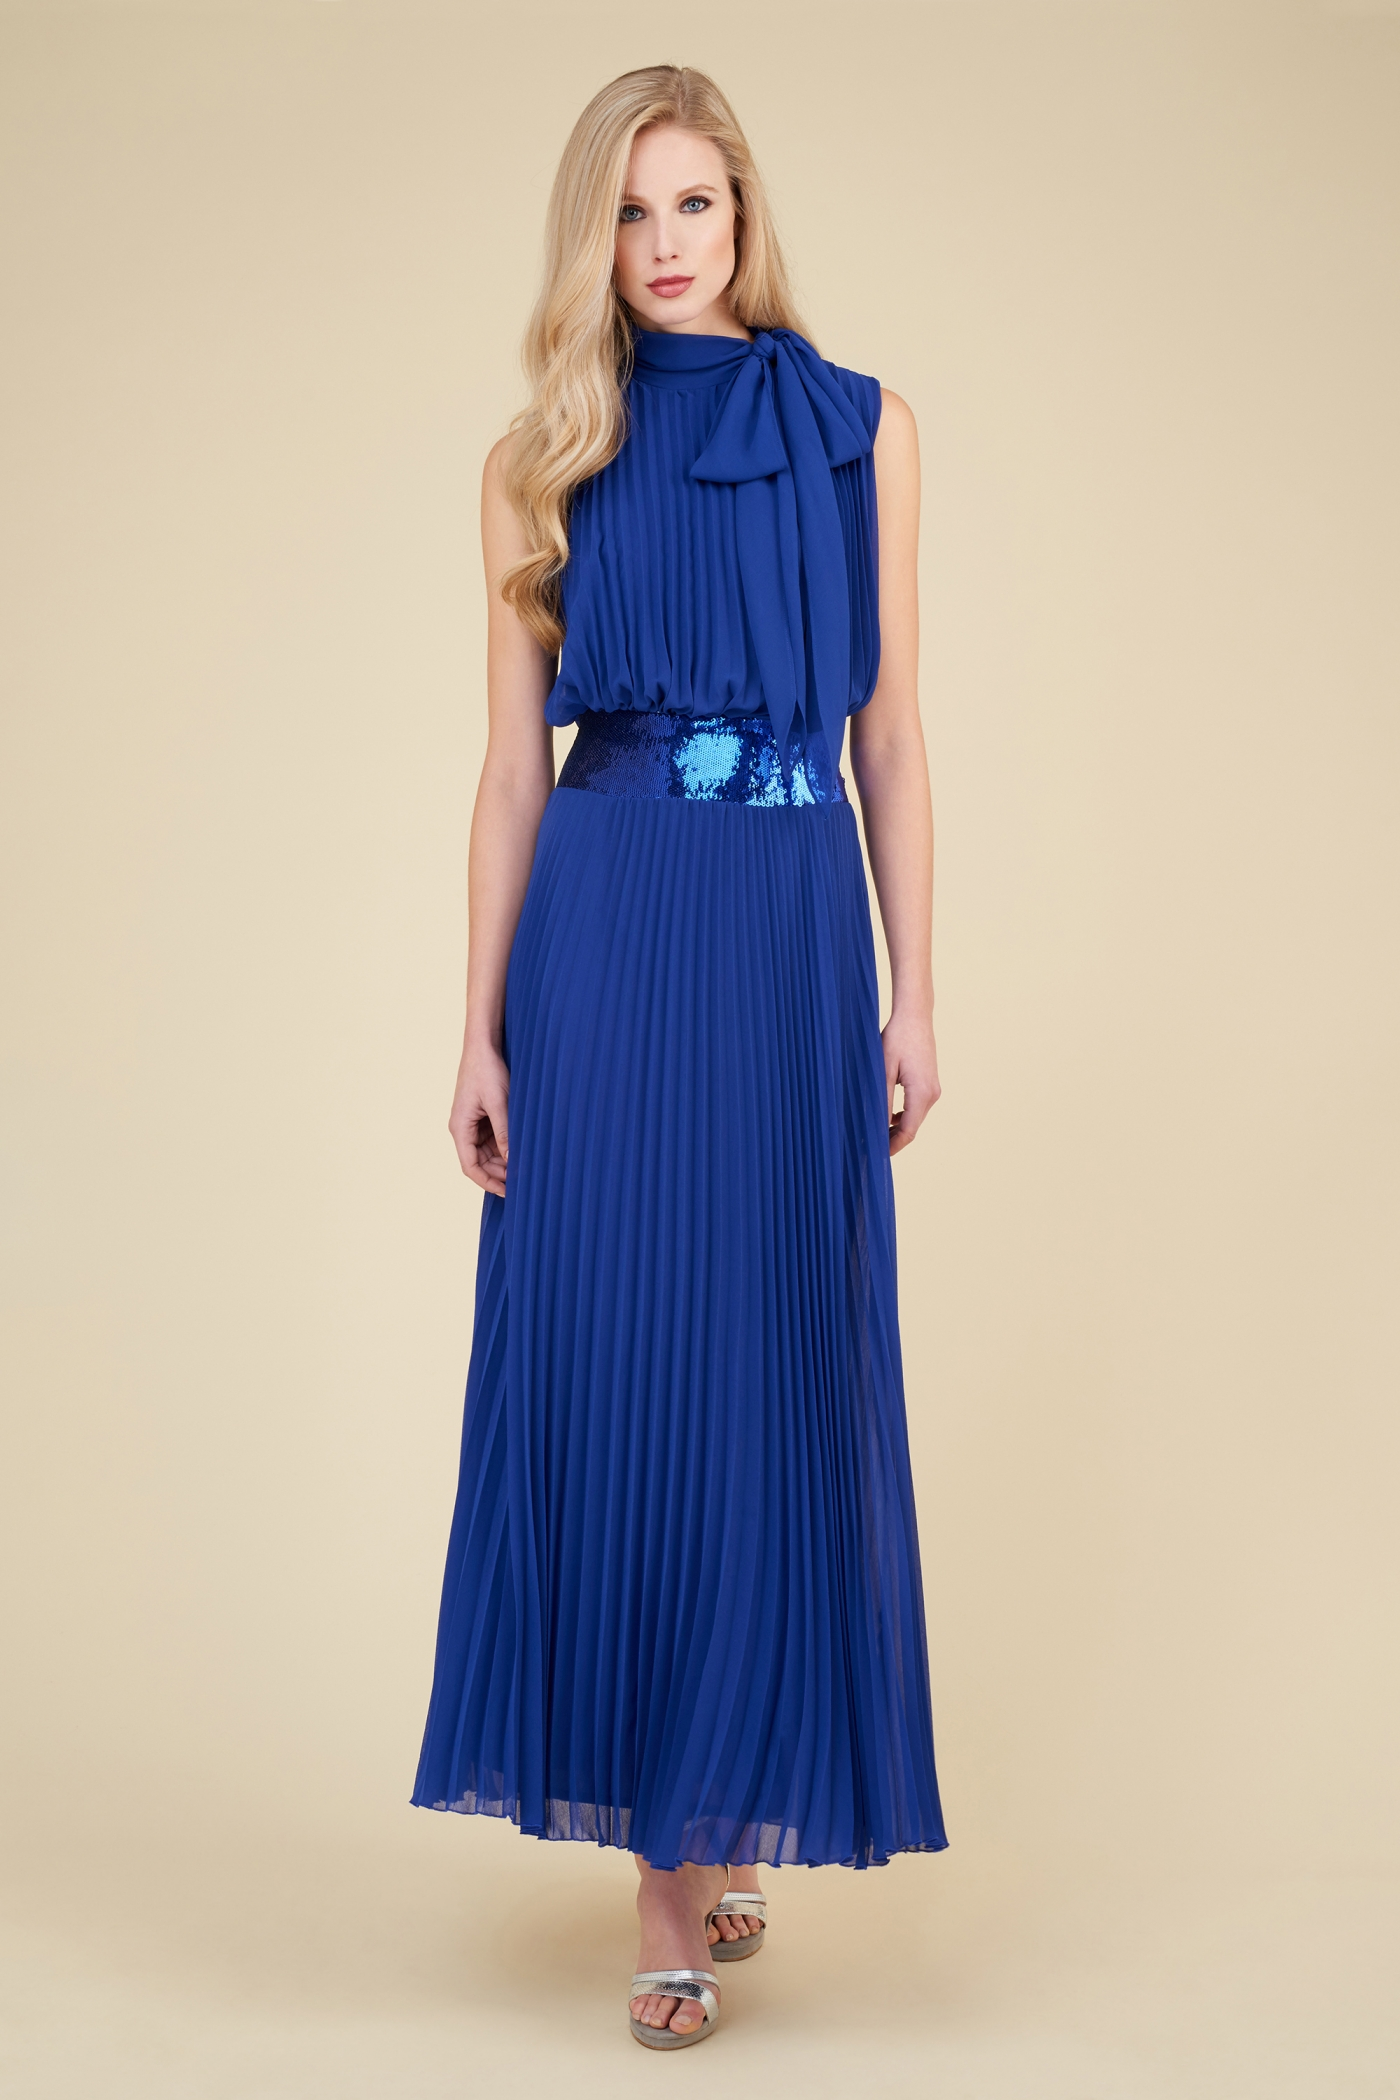 Vestito da cerimonia blu lungo Luisa Spagnoli